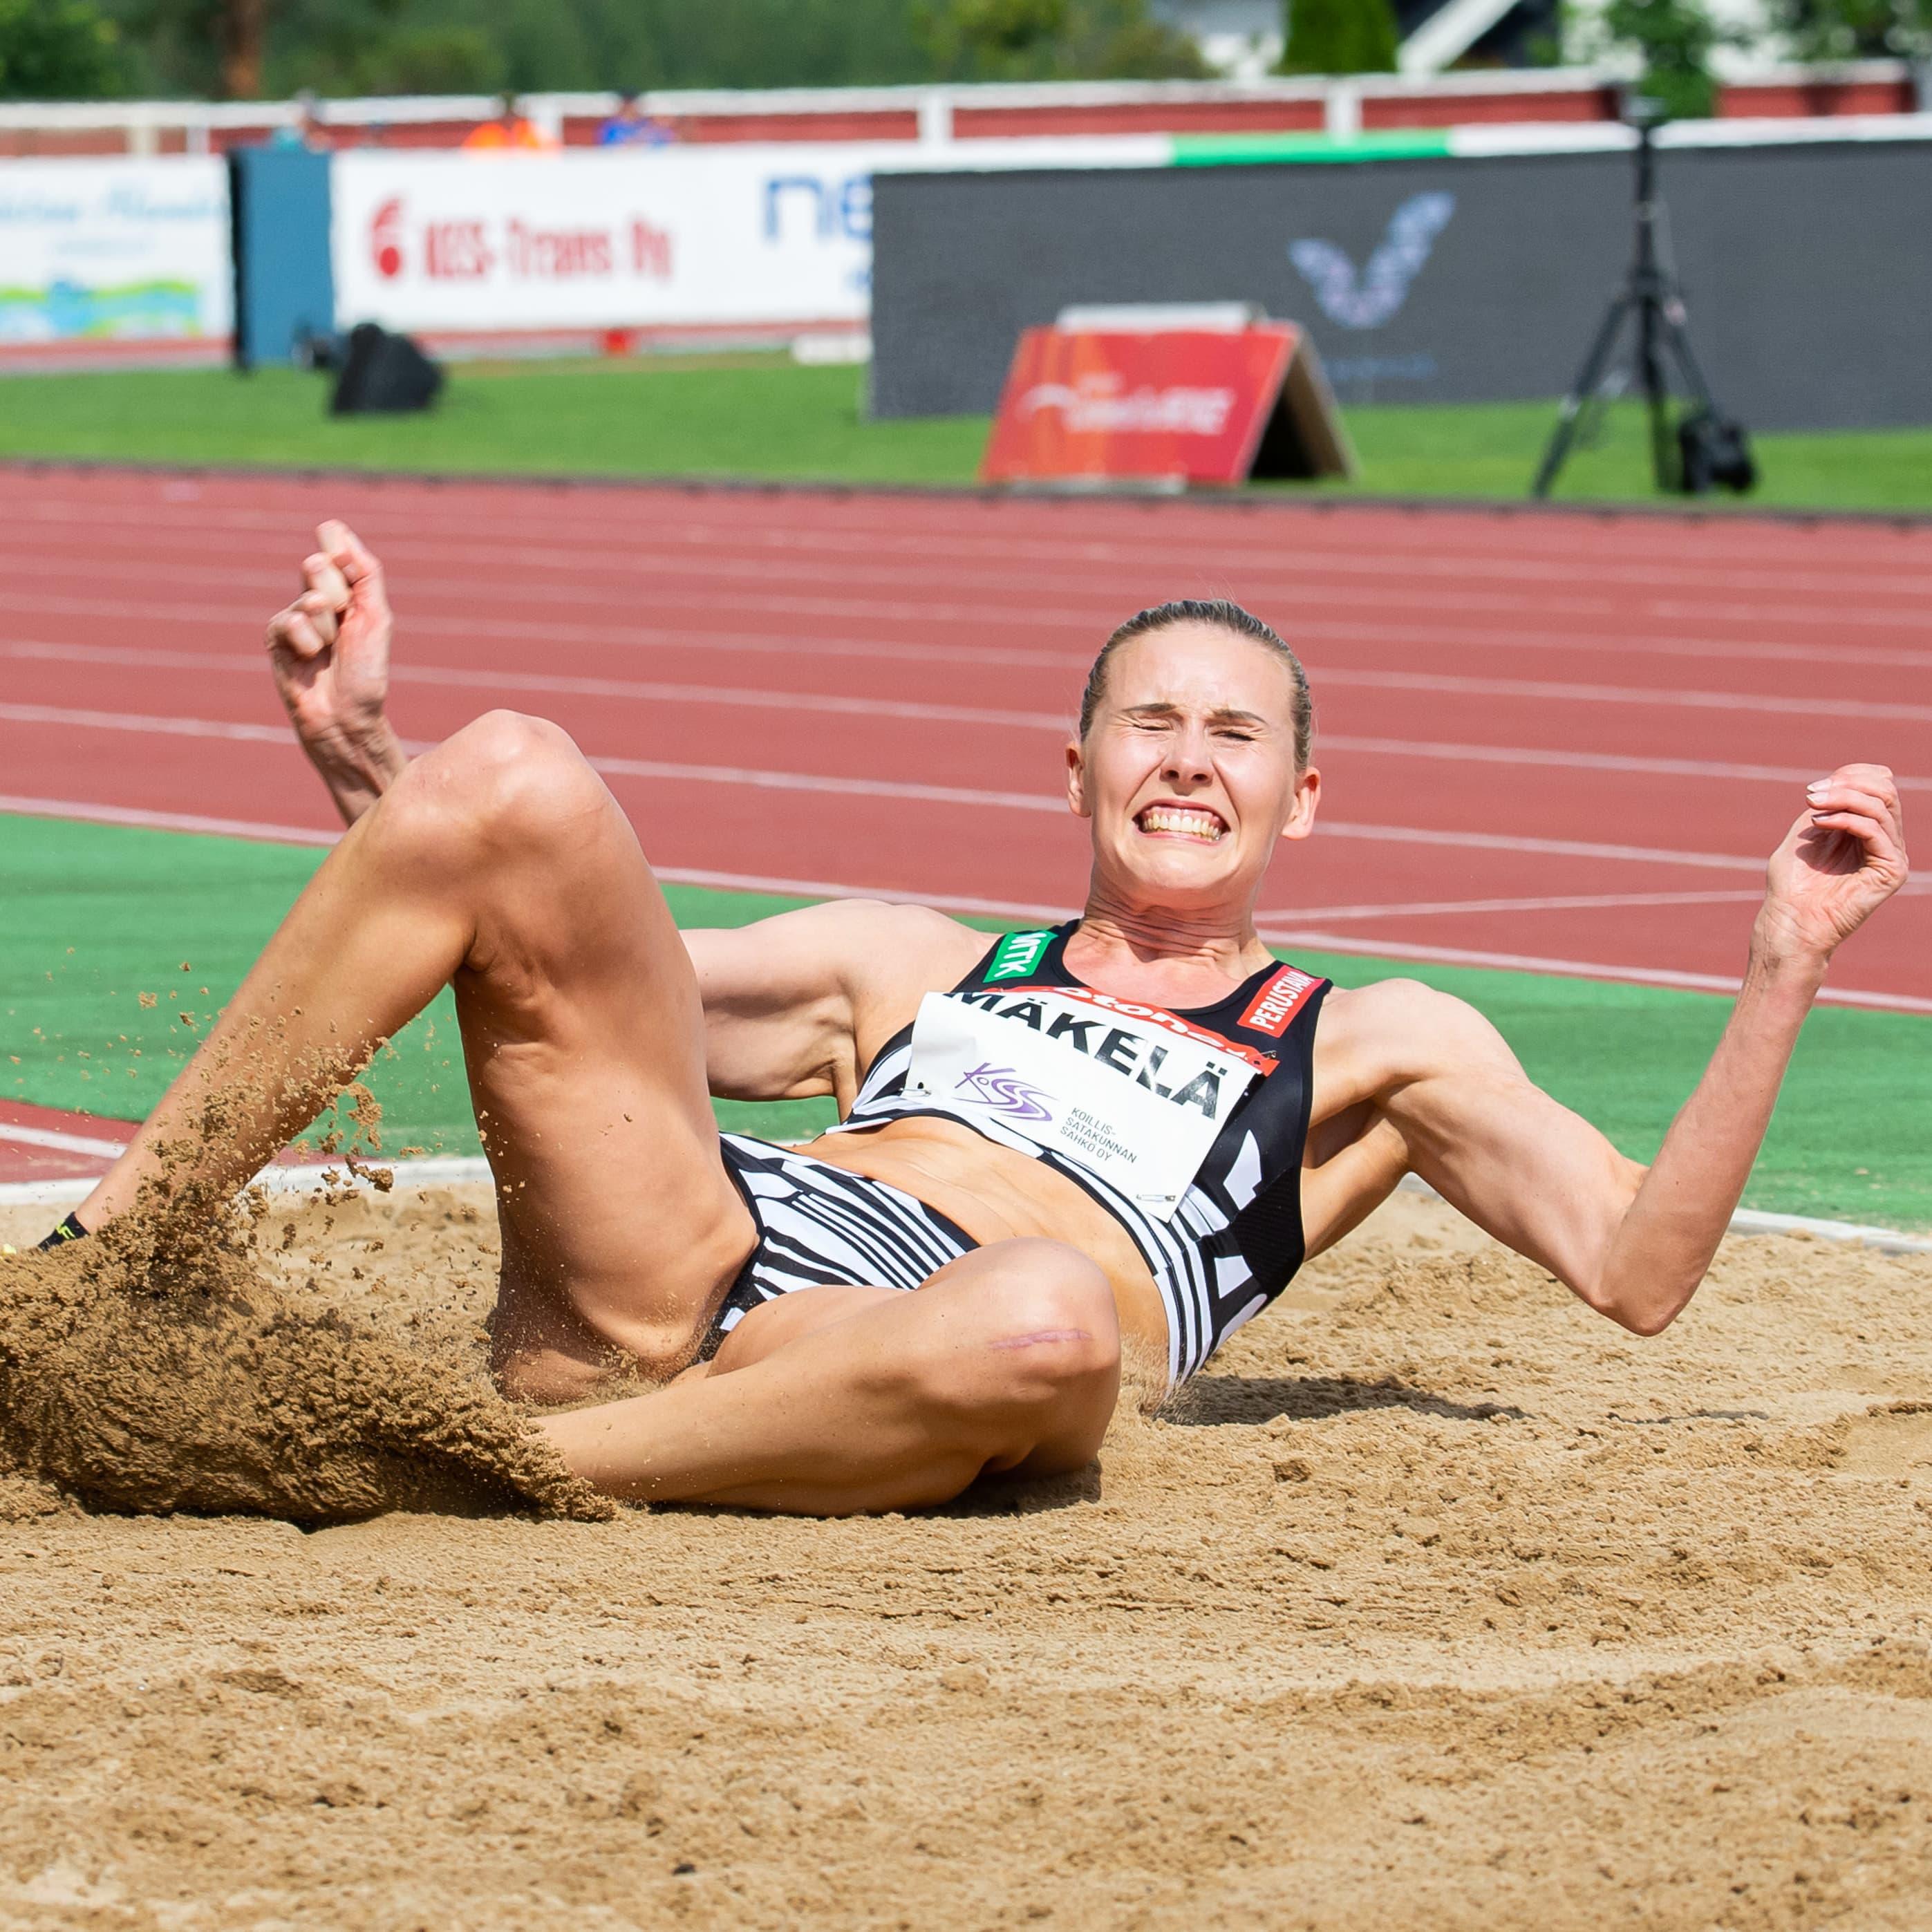 Kristiina Mäkelä landar i sanden.